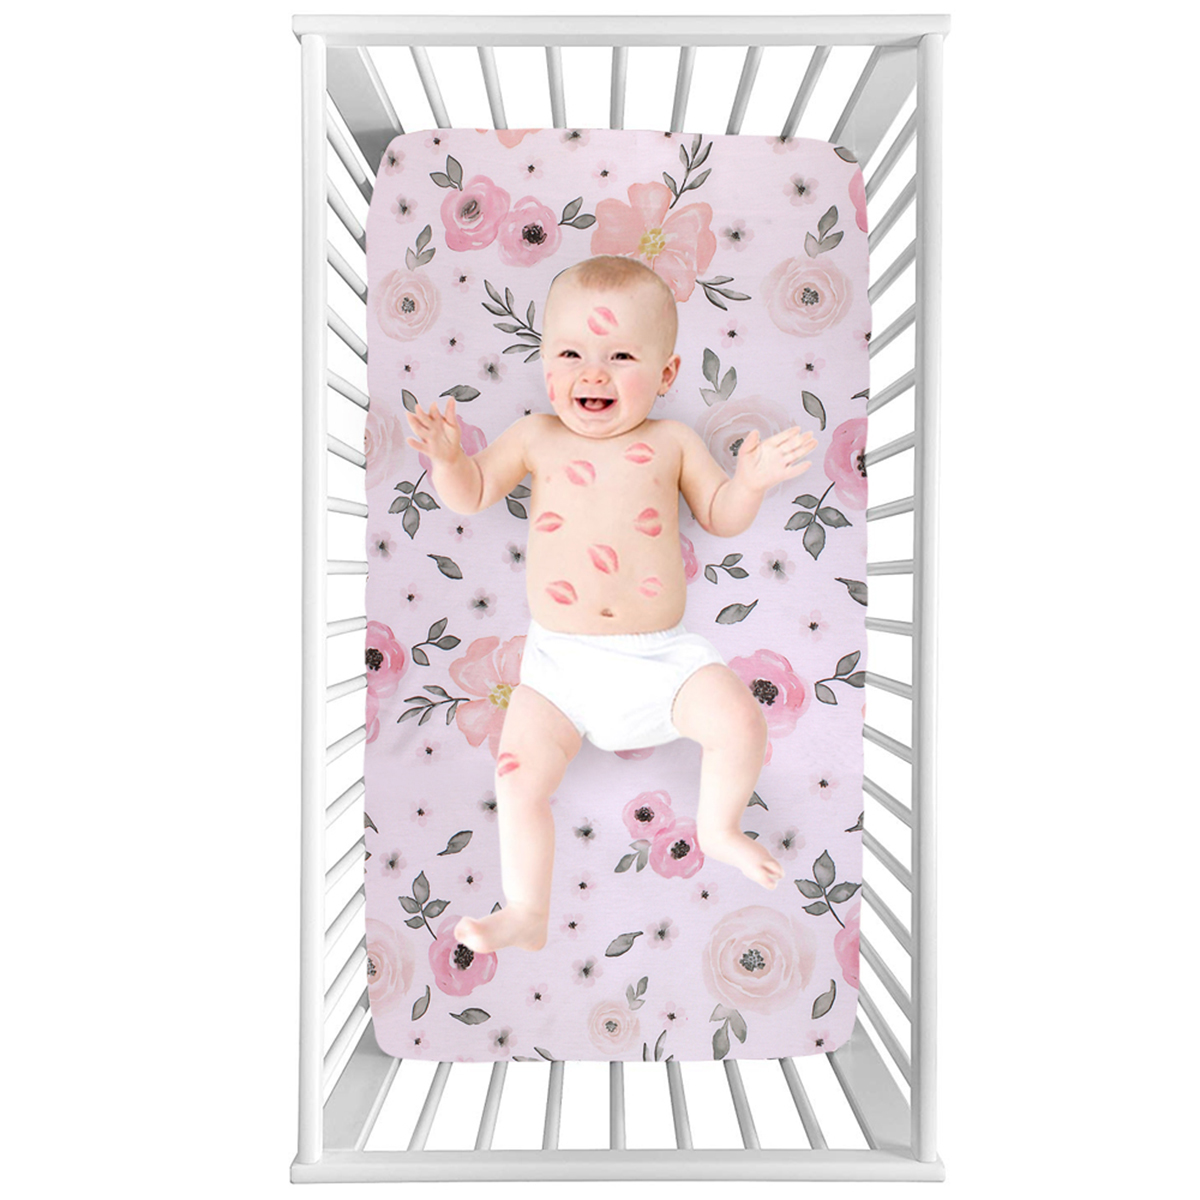 Baby Crib Sheet Urine Changing Pads Urine Pad Floral Printed Reusable Infant Bedding Nappy Burp Mattress Changing Mat